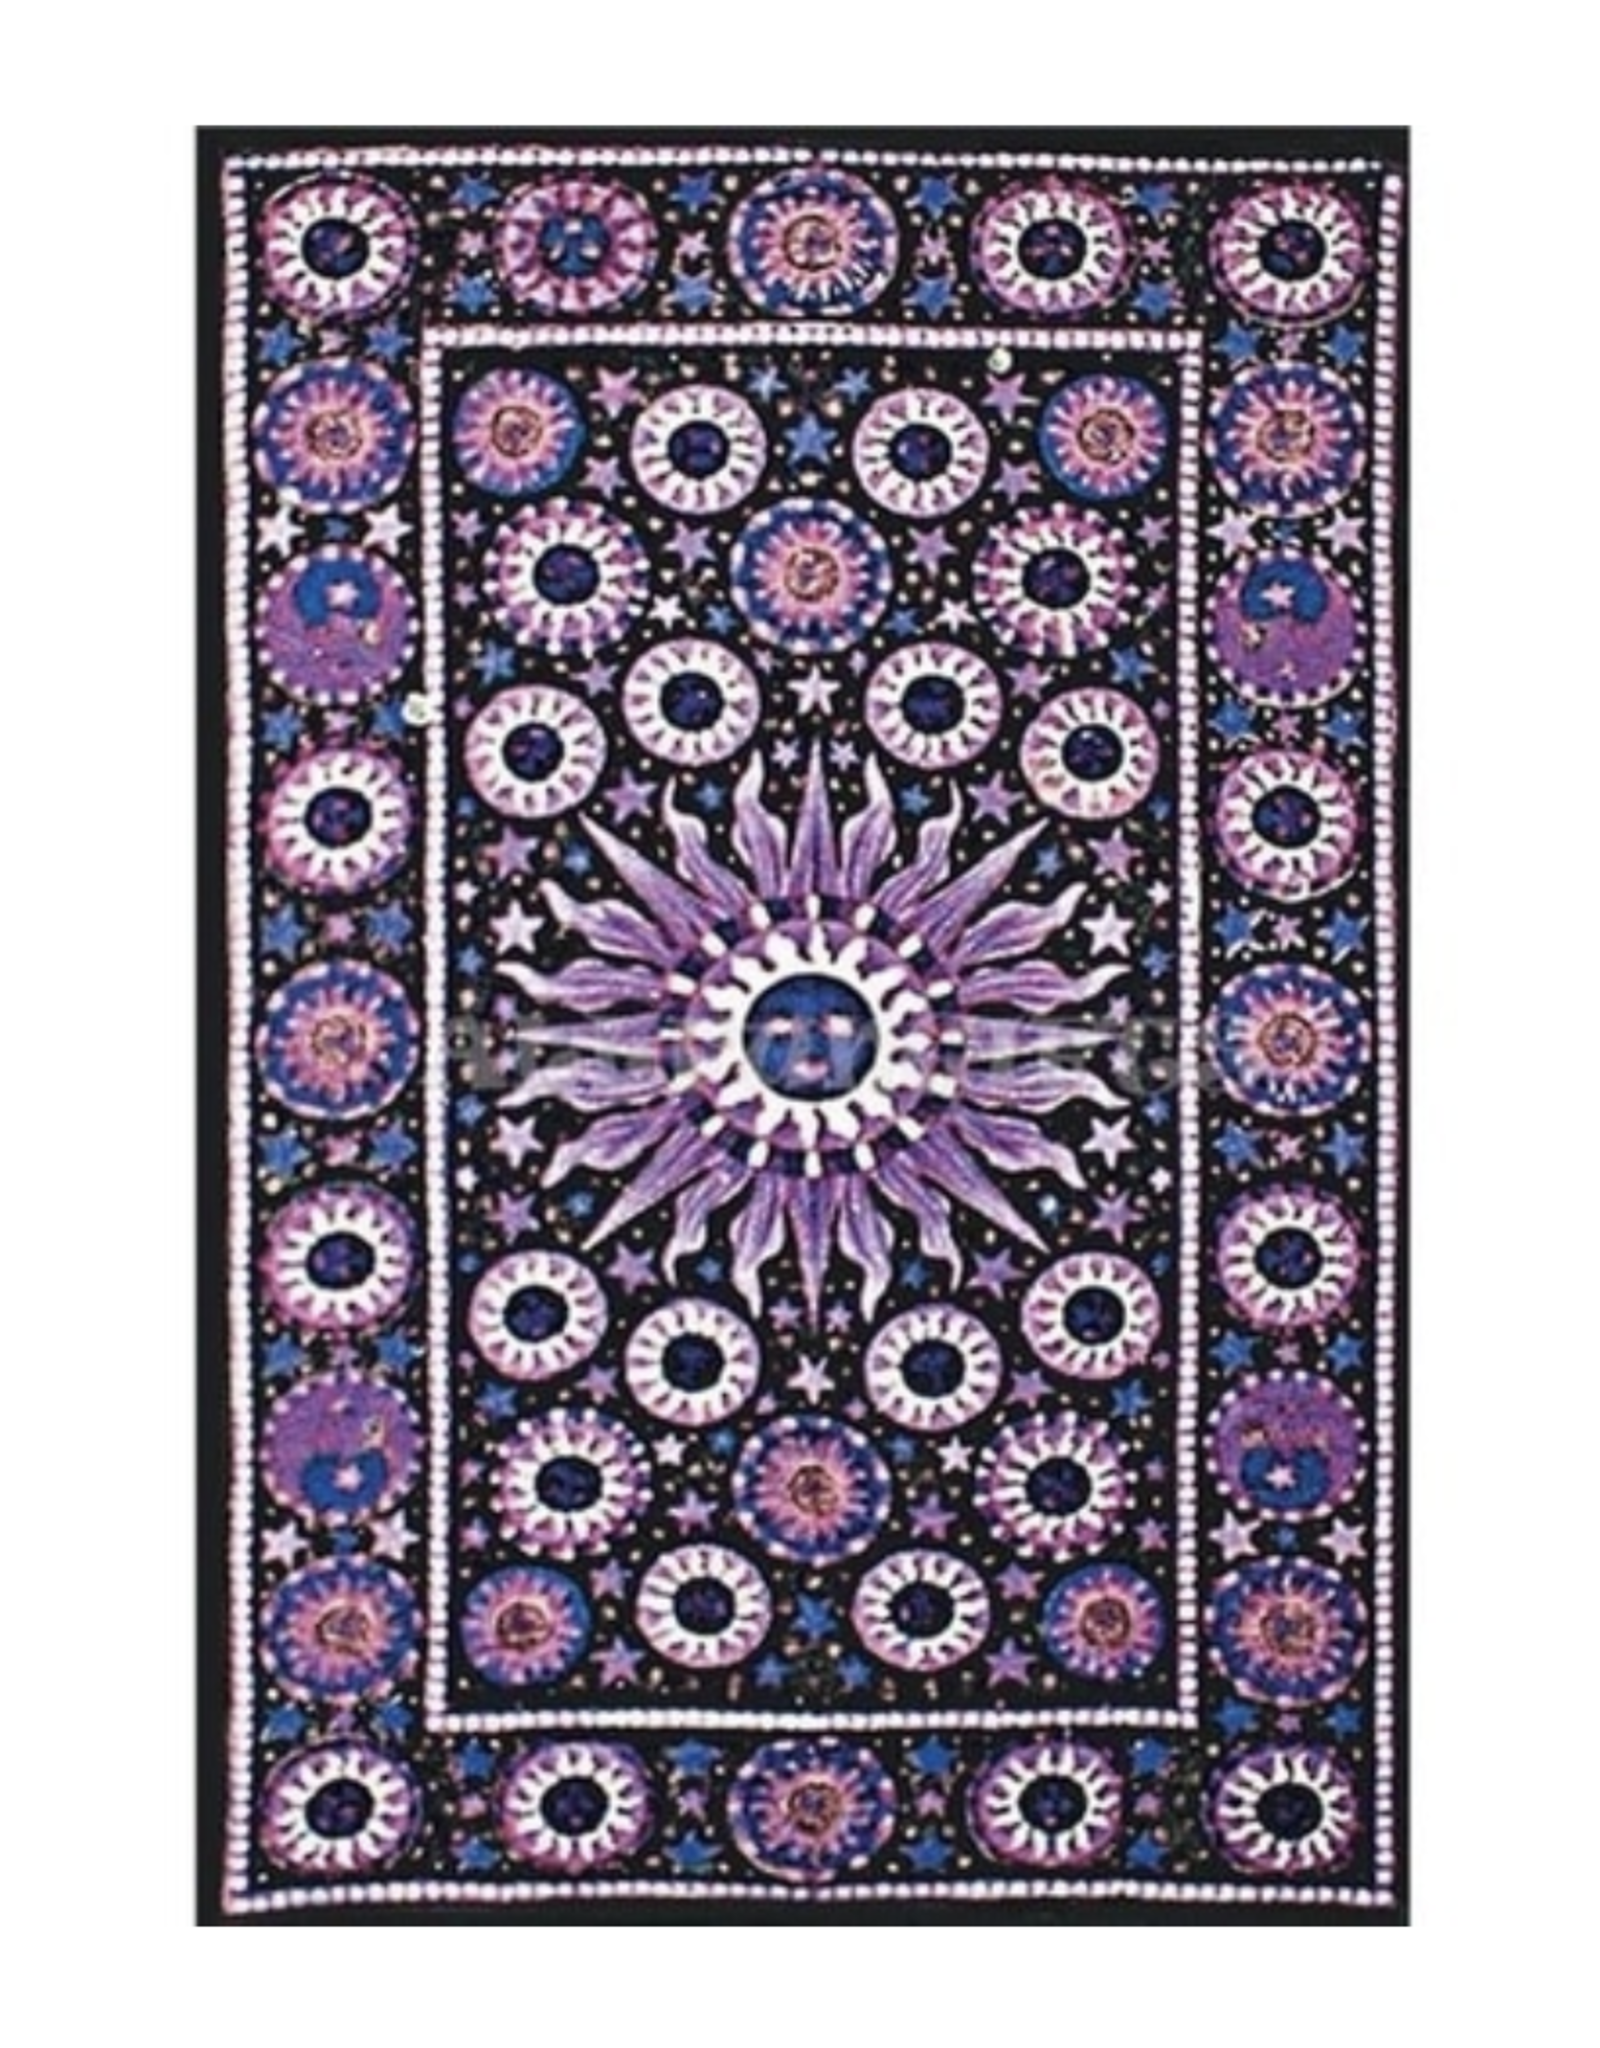 "ThreadsHeads 55"" x 85"" Tapestry - Sun, Moon & Stars"